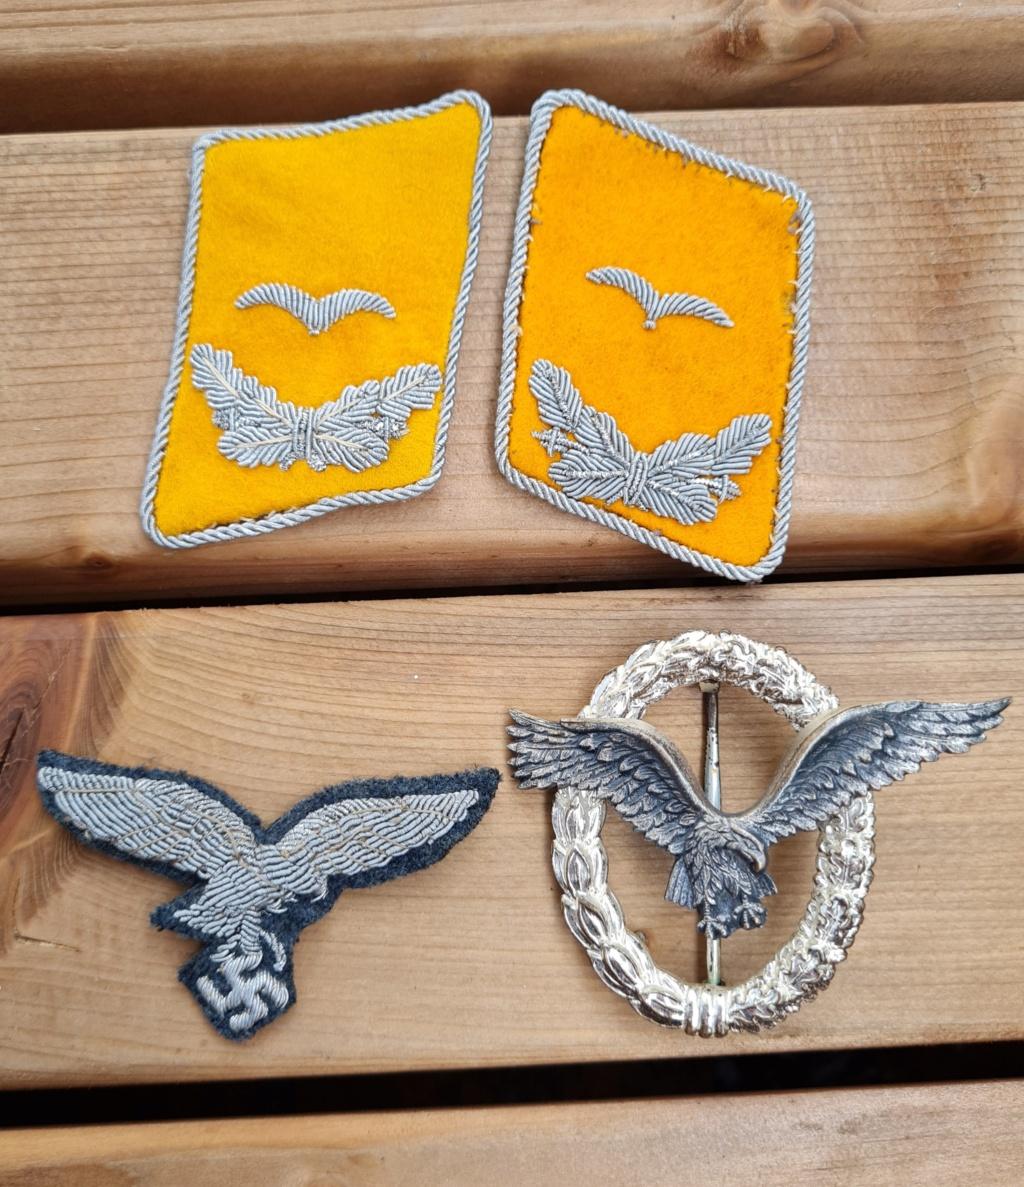 Grouping pilote de chasse Luftwaffe identifié  20210349